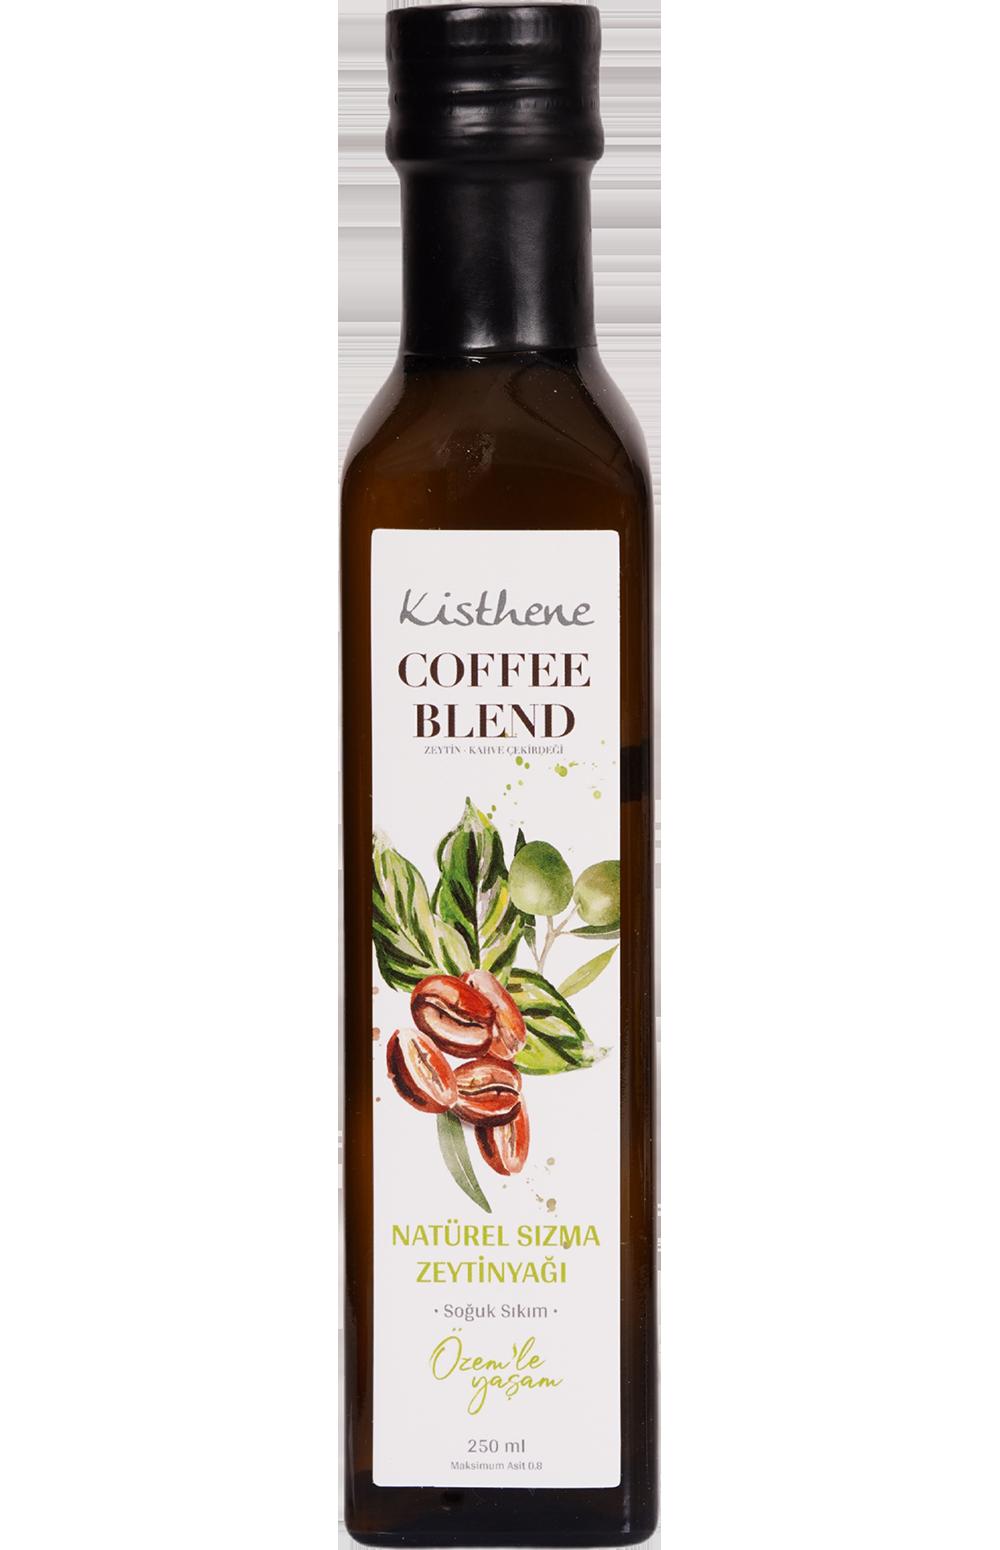 Kisthene Coffee Blend